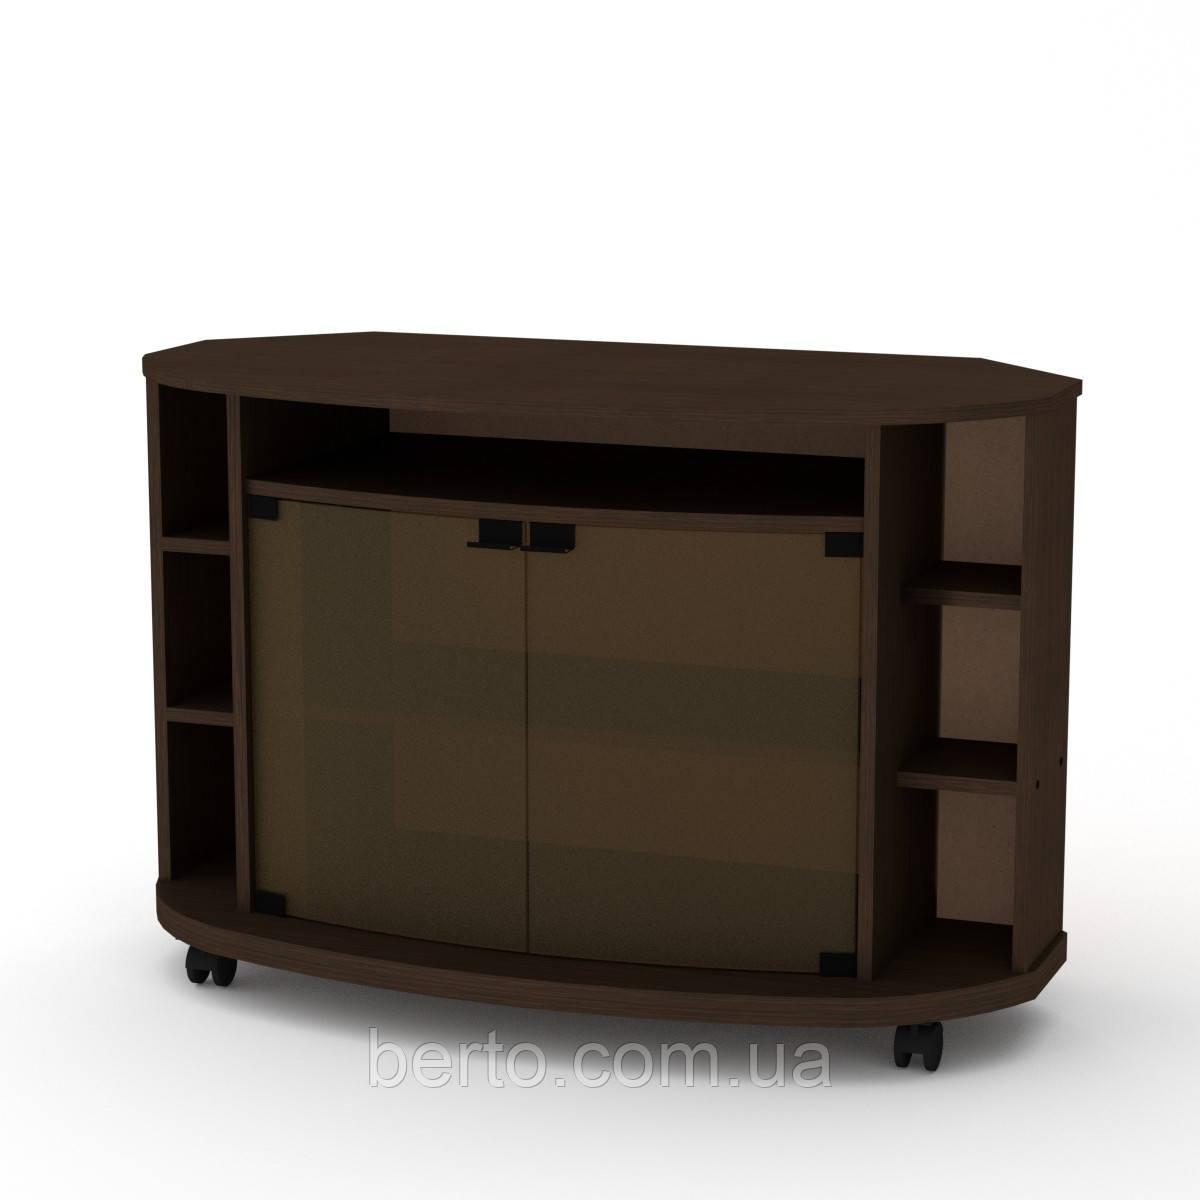 Уловая тумба под  телевизор Хортица